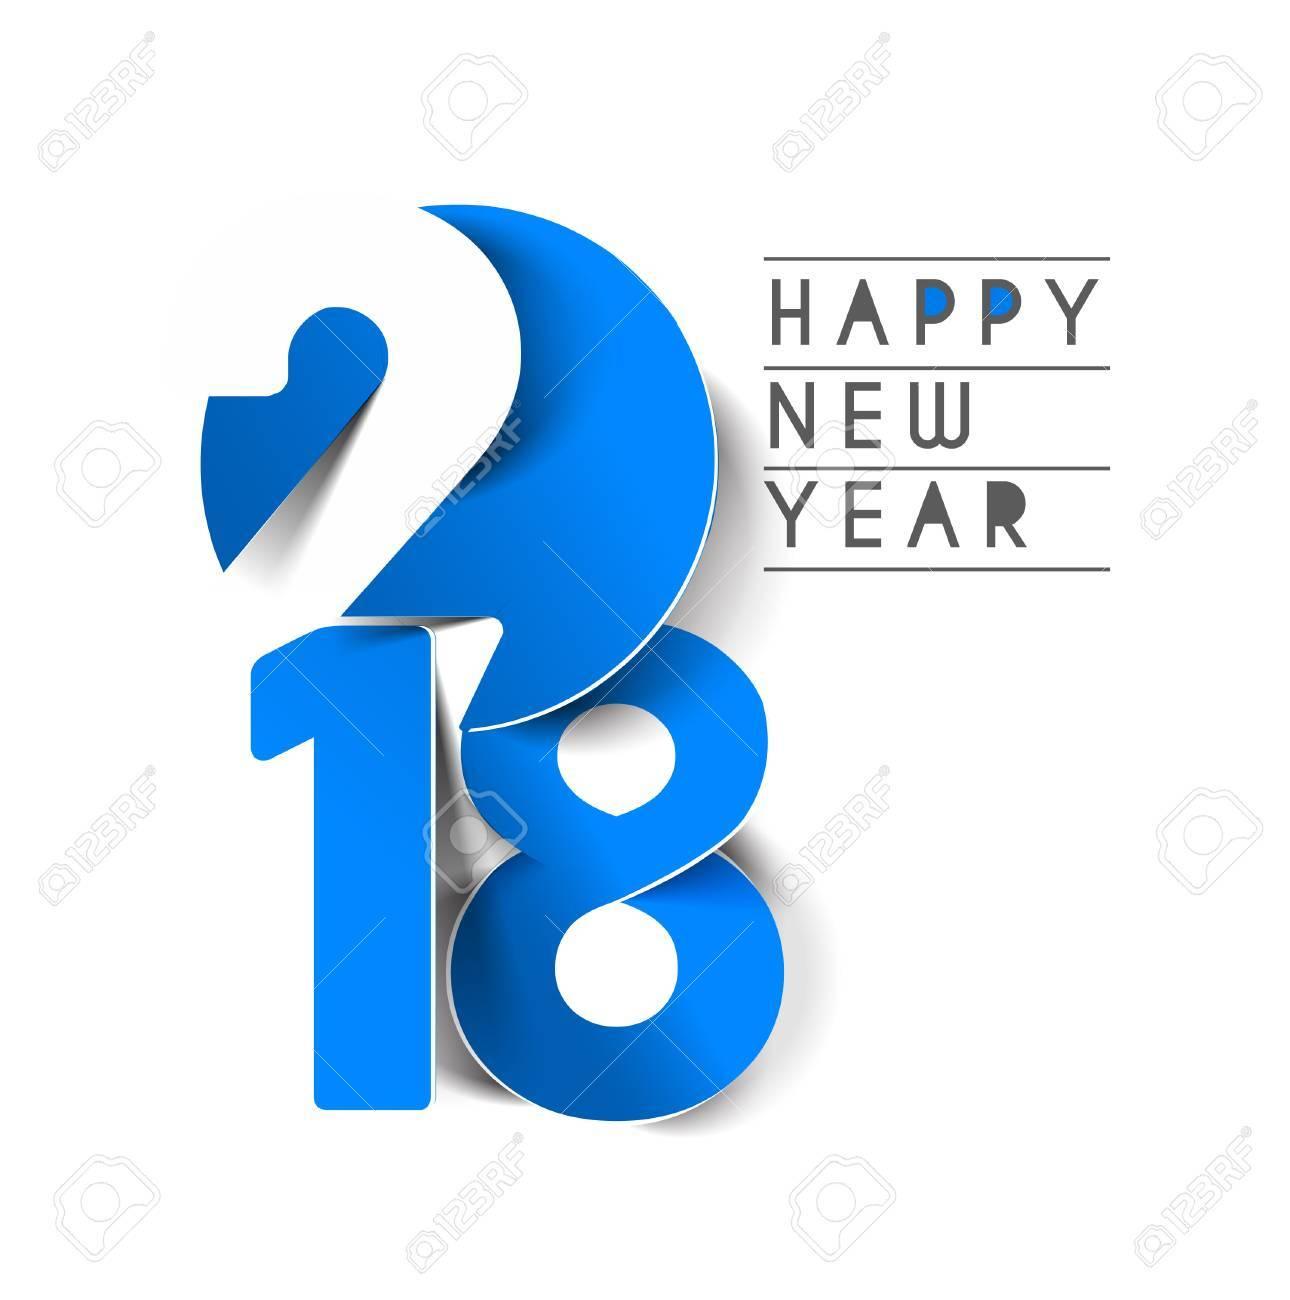 Happy new year 2018 Text Design, Vector illustration. Stock Vector - 89707648